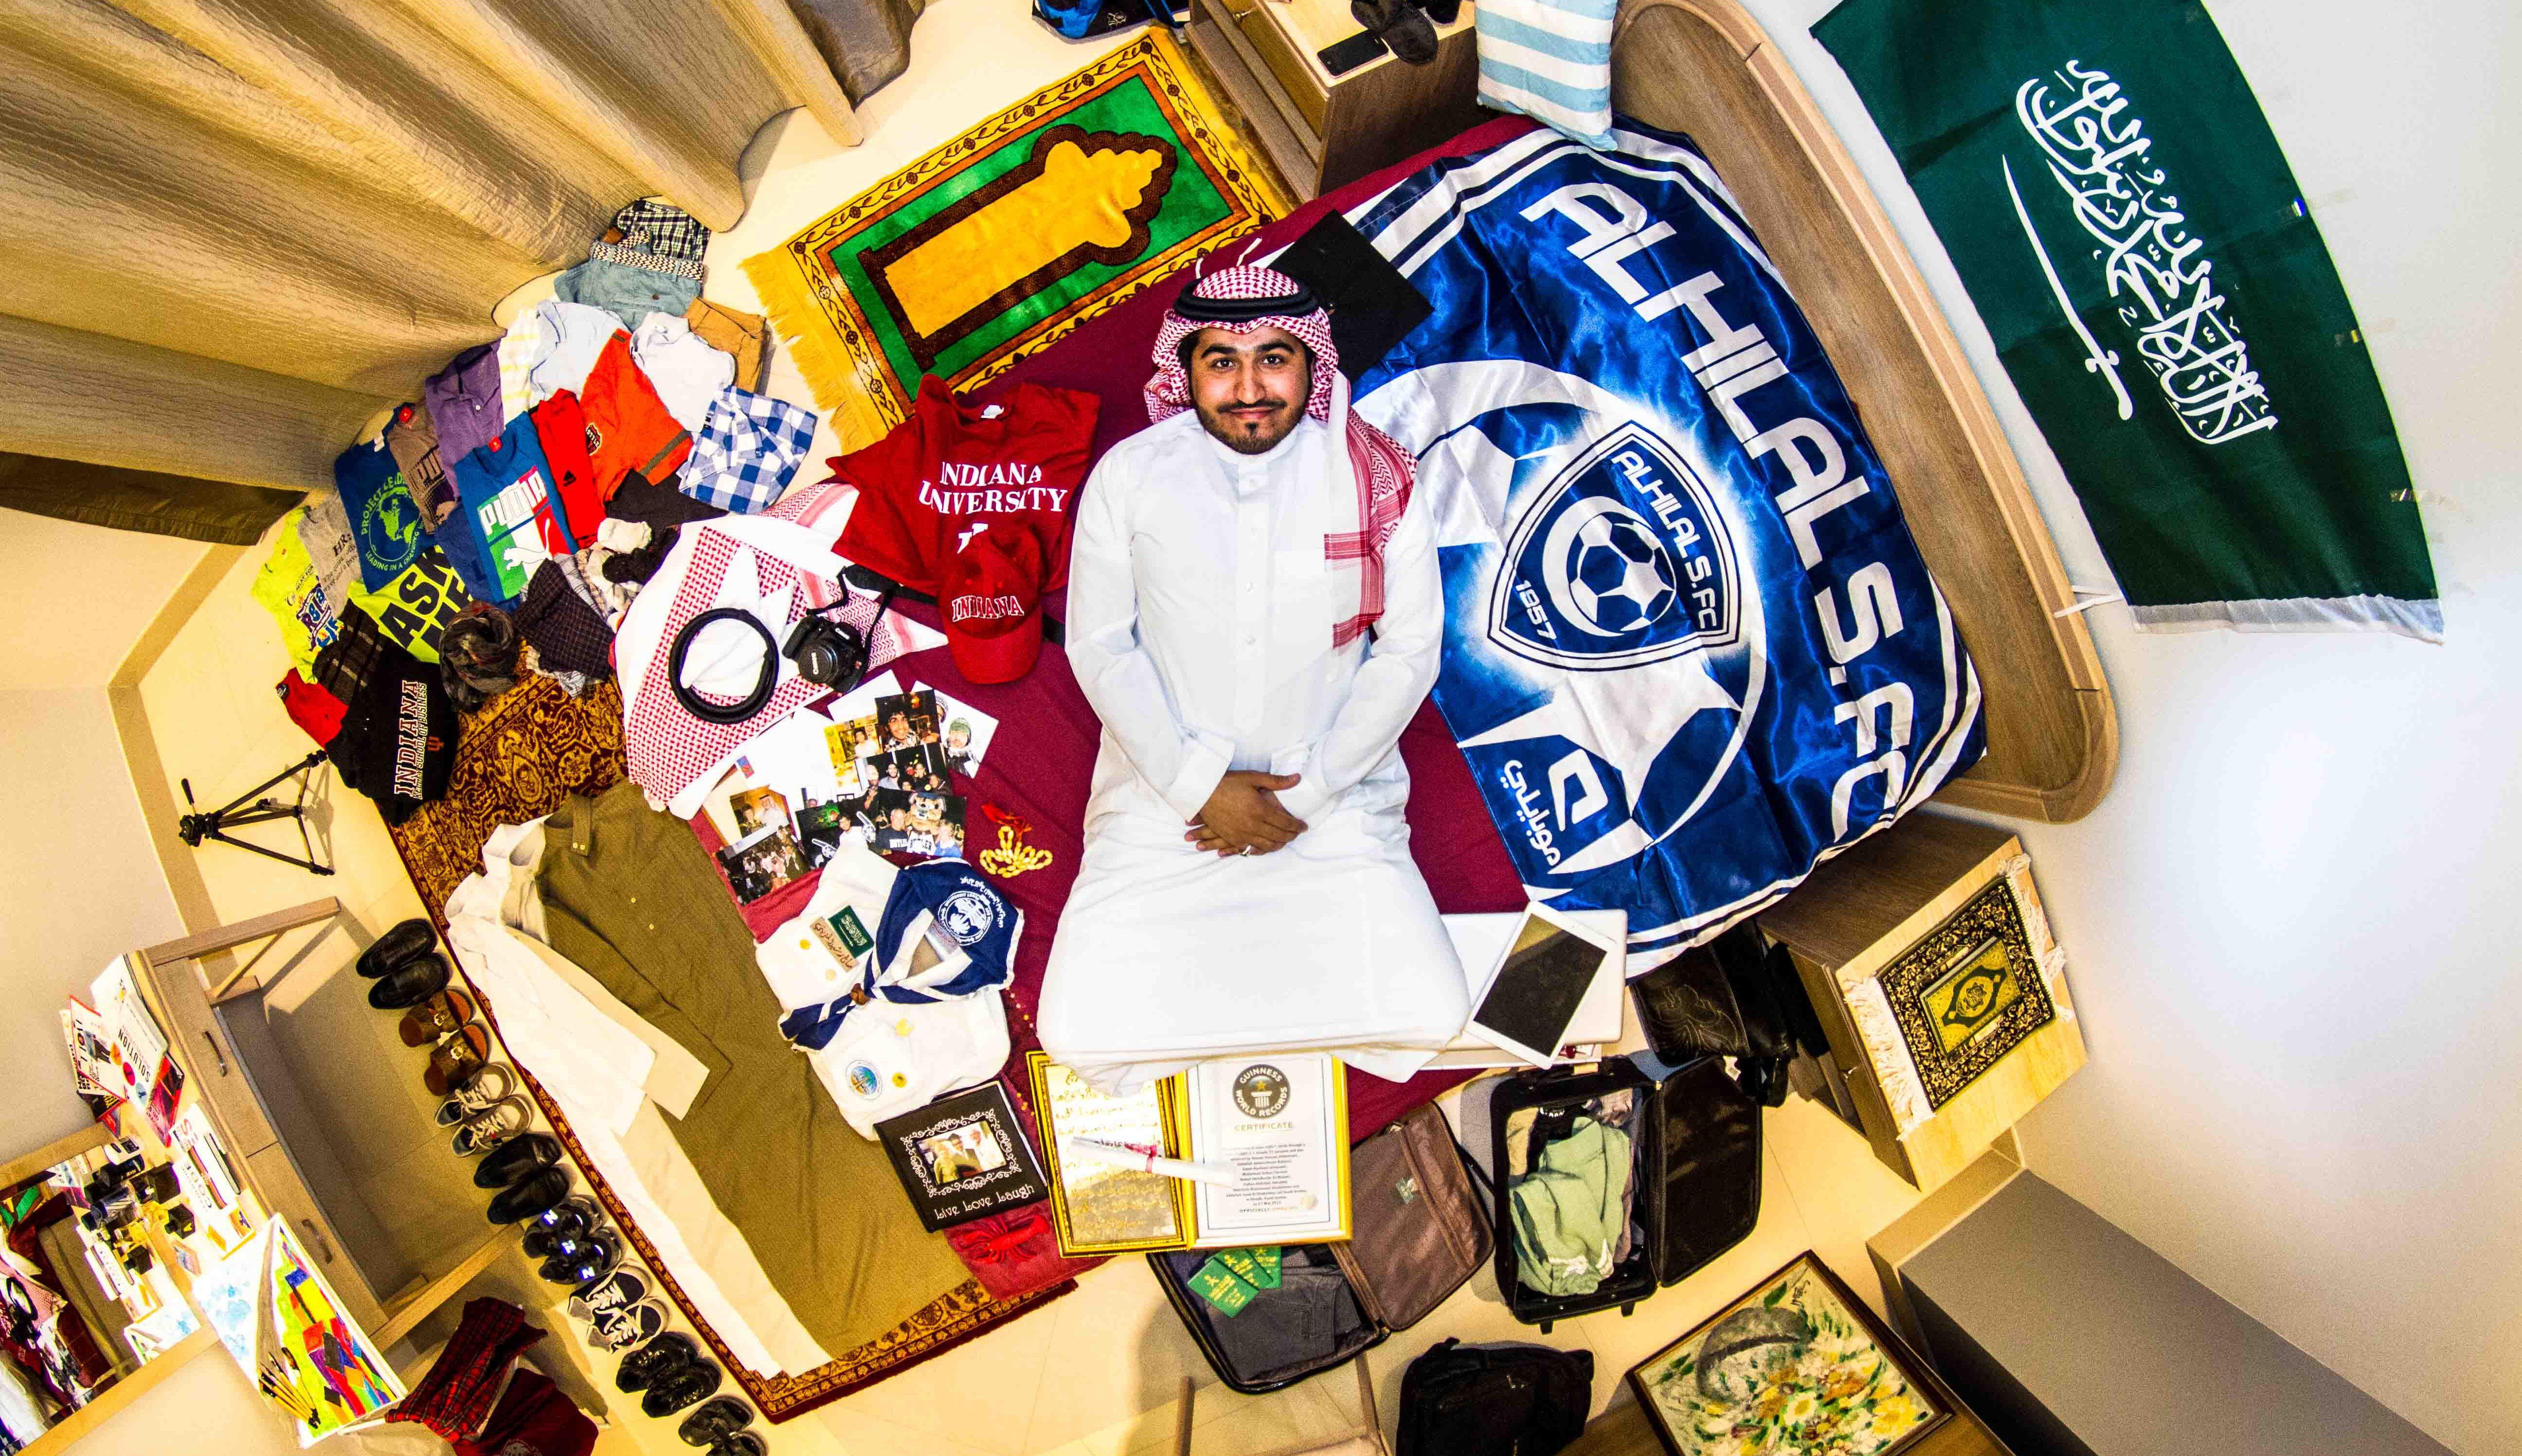 Saleh, human resources officer, 30 years old, Riyadh, Saudi Arabia.